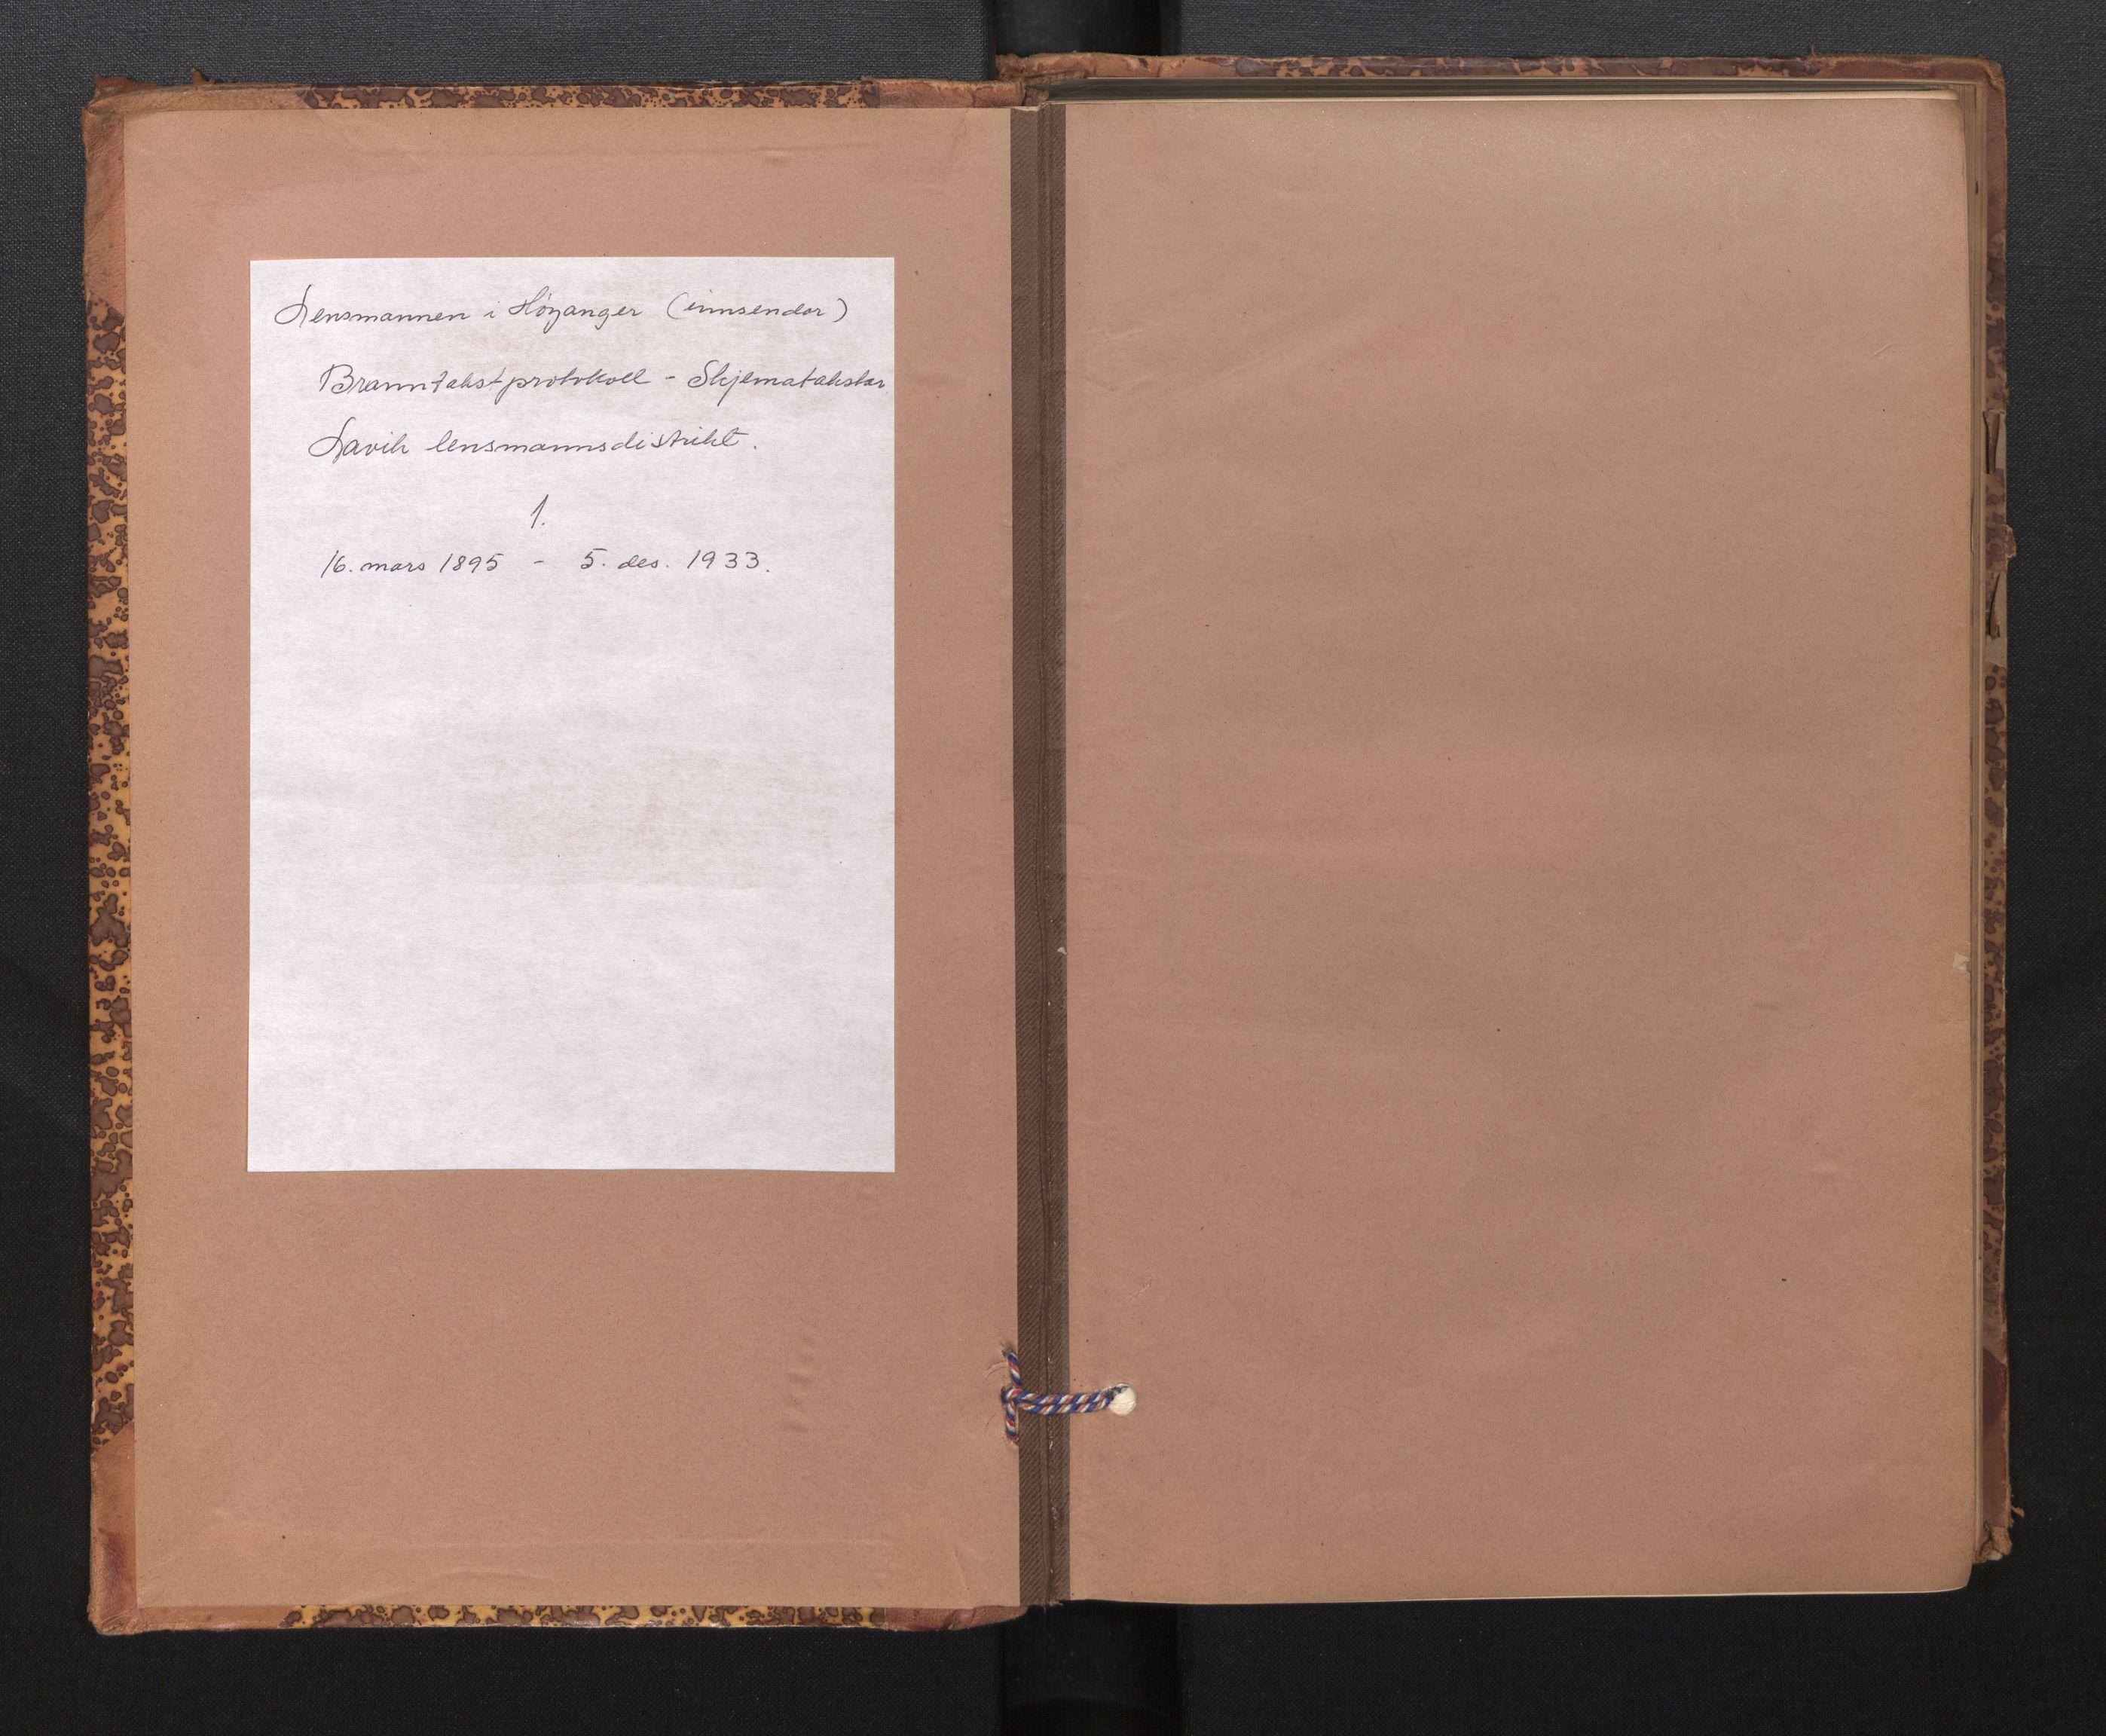 SAB, Lensmannen i Lavik, 0012/L0002: Branntakstprotokoll, skjematakst, 1895-1933